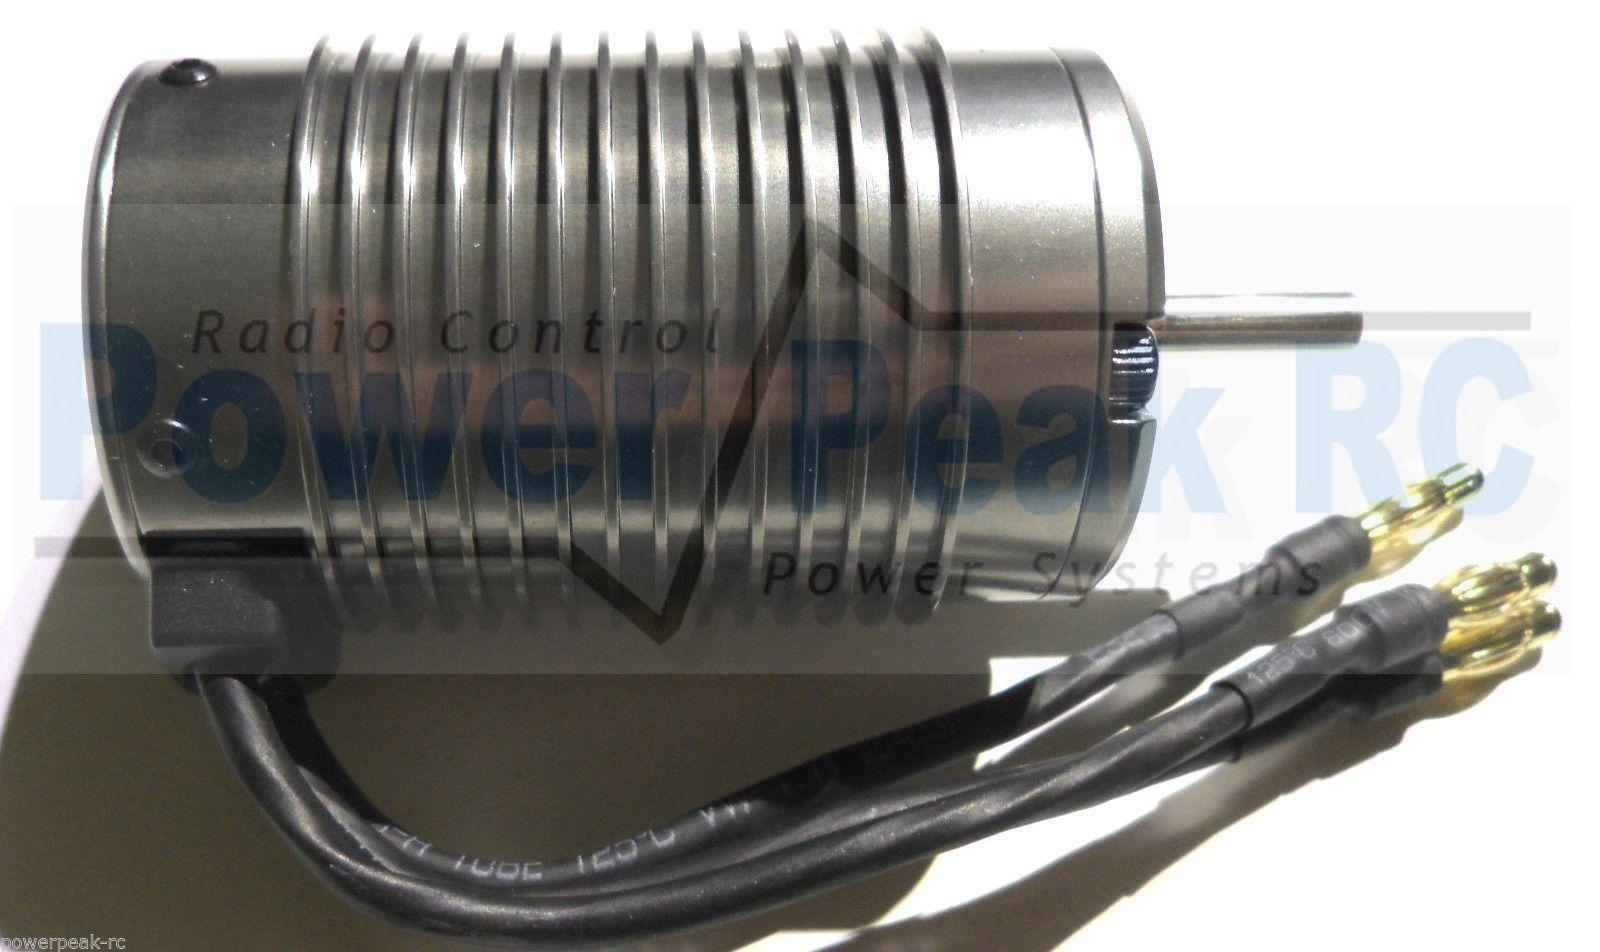 Turnigy 1 8 Motor sin Cepillo Sensorless - 2100kv 4s 80a 4Pole